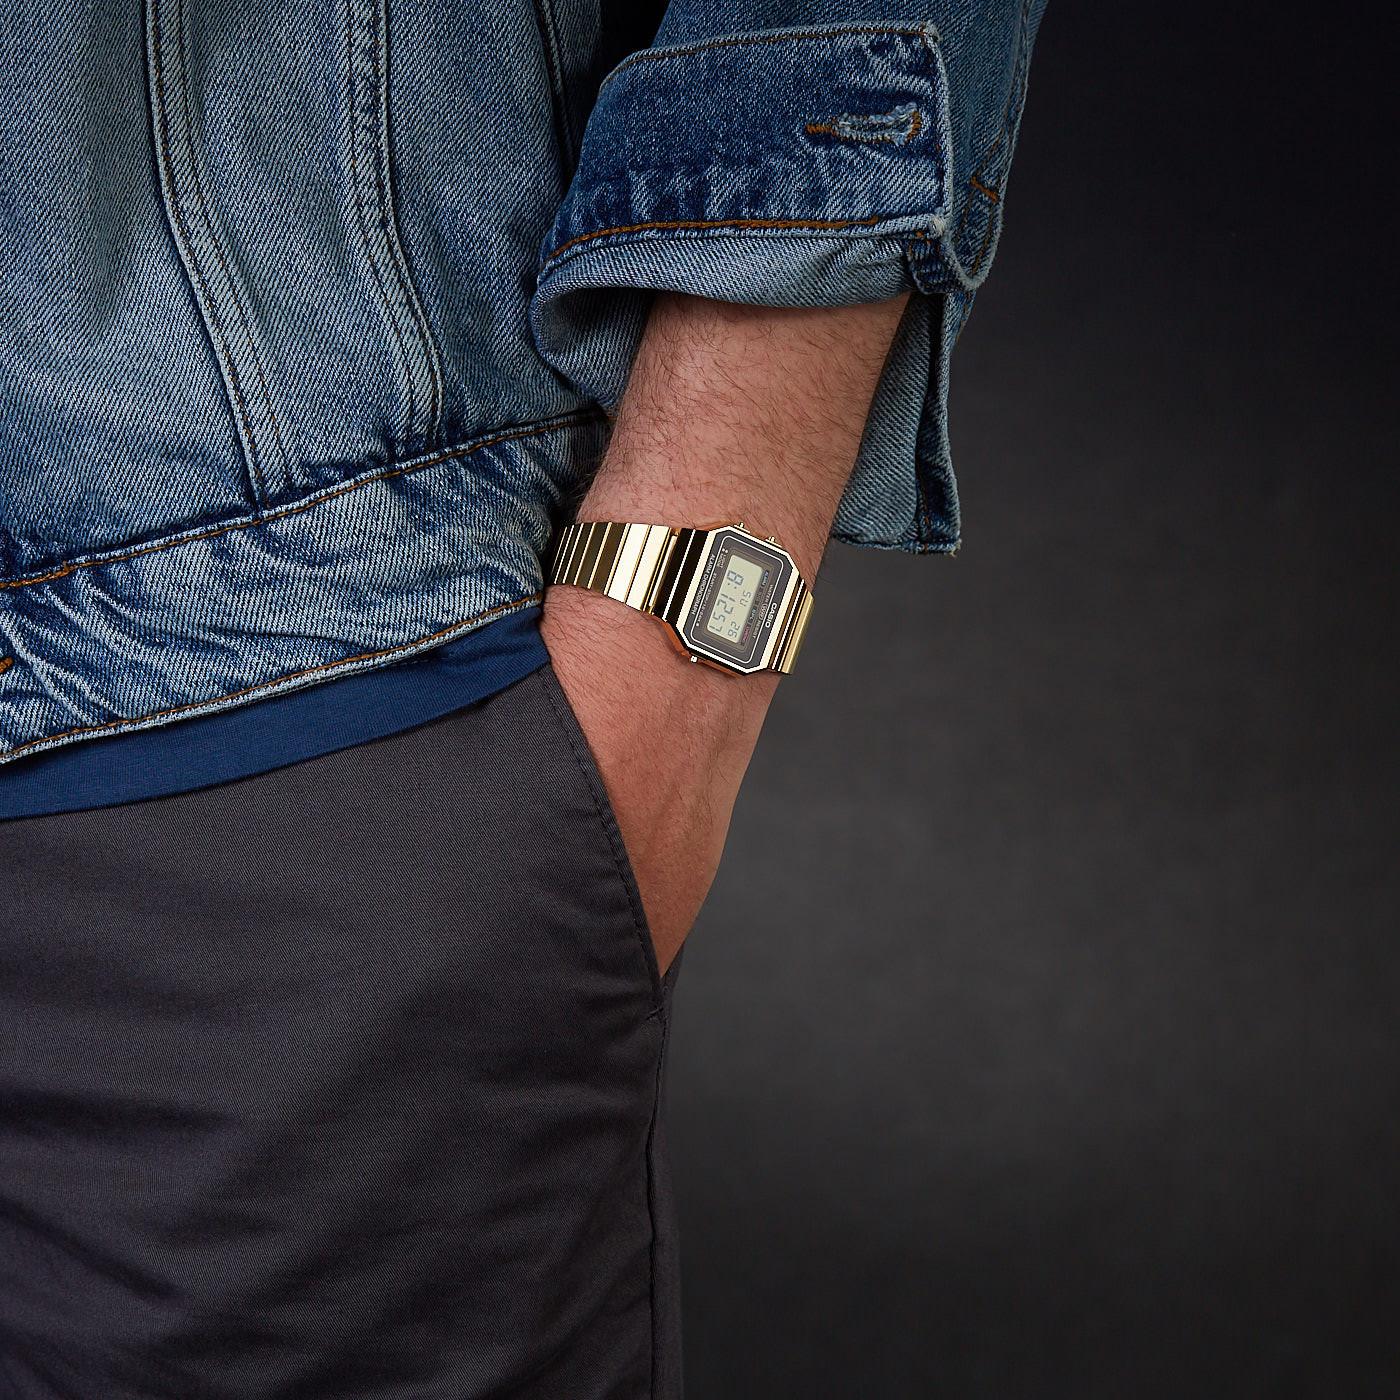 Casio Edgy Horloge A700WEG-9AEF